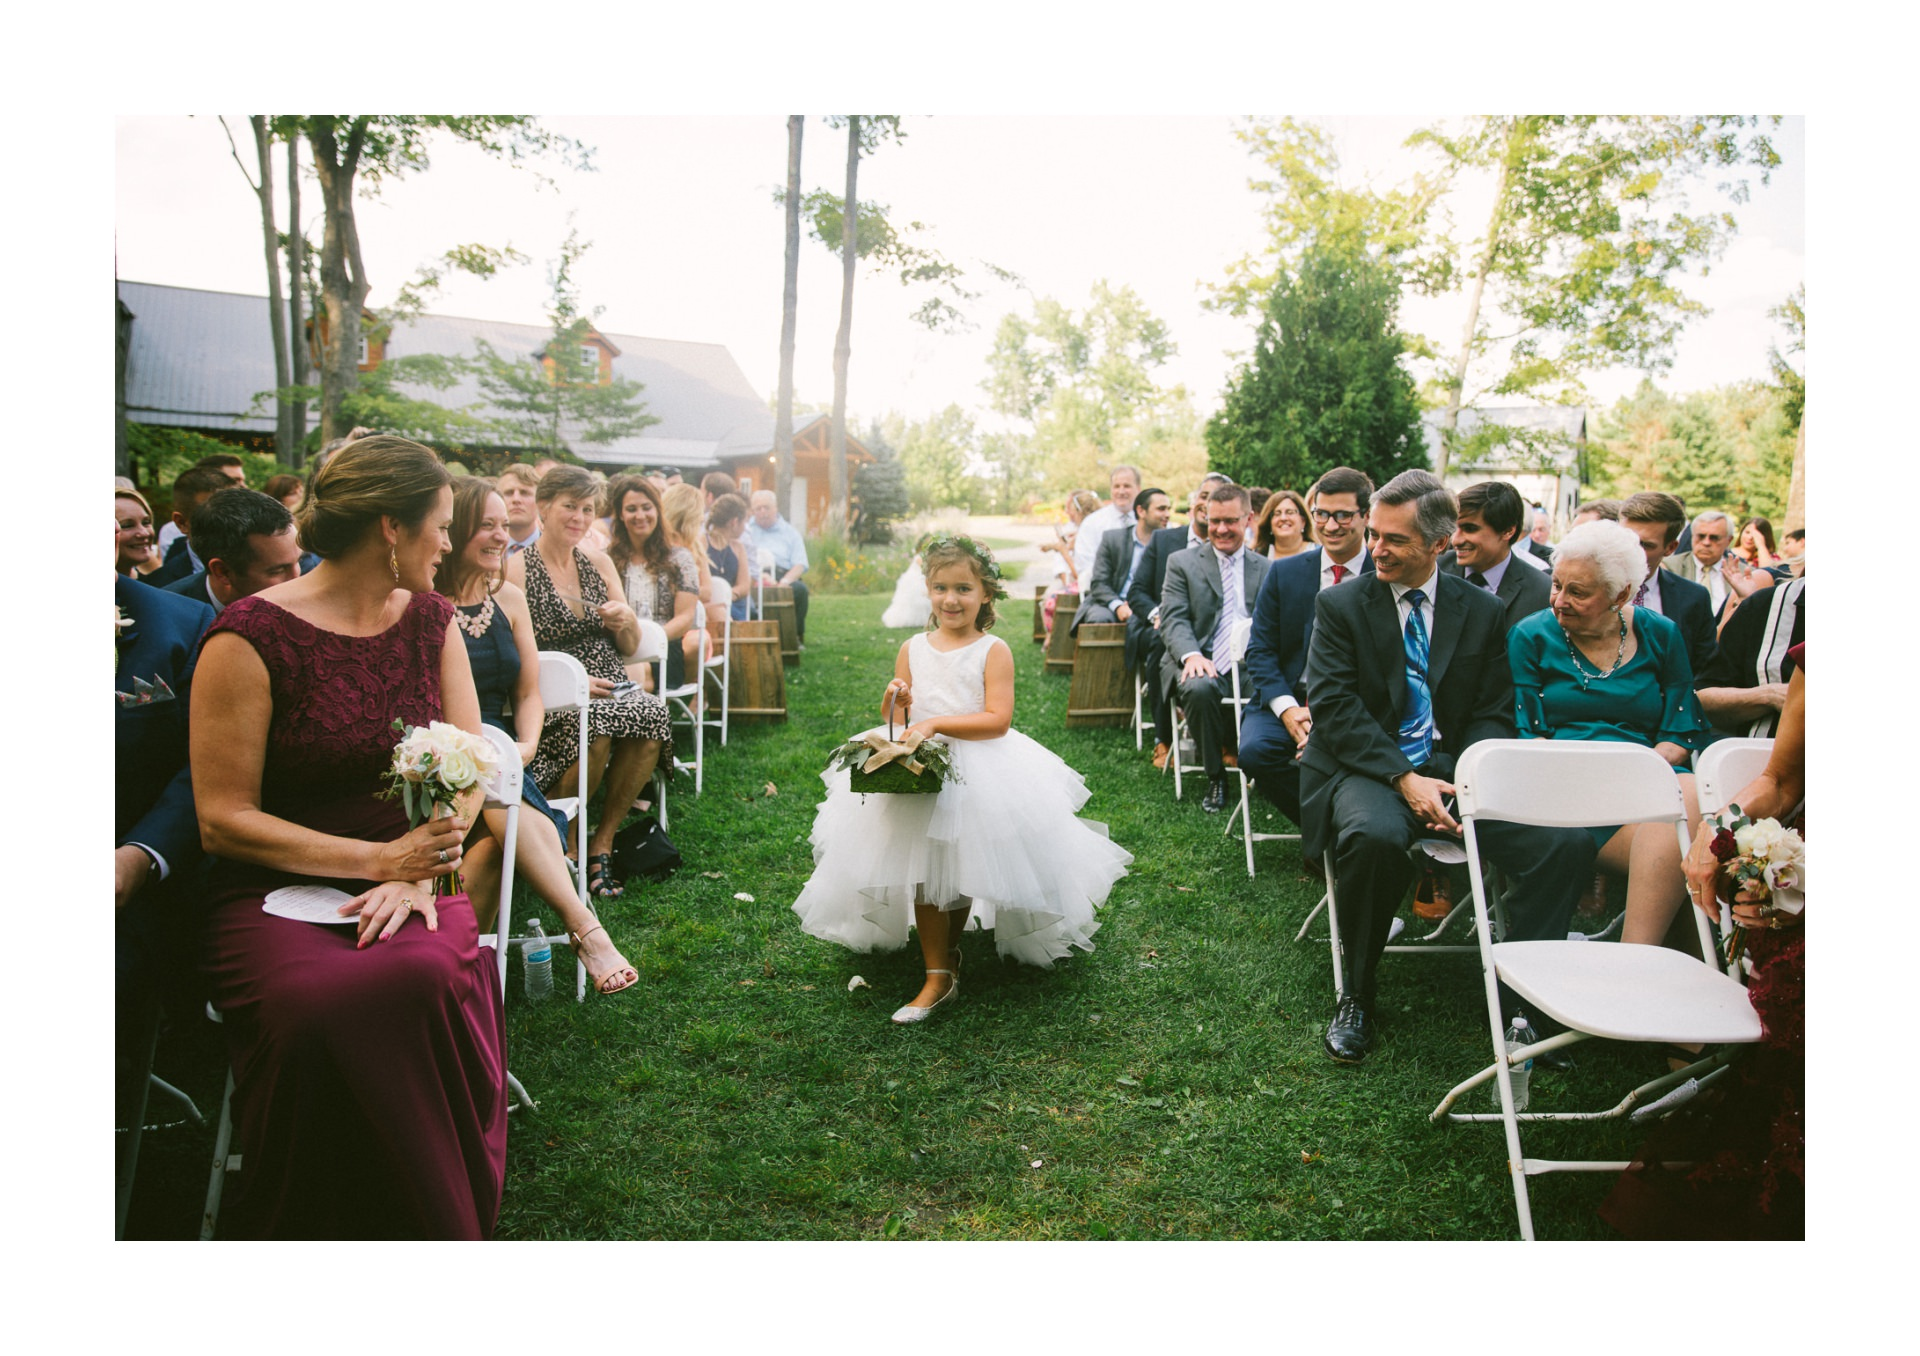 Meadow Ridge Farm Wedding Photos in Windsor 2 17.jpg